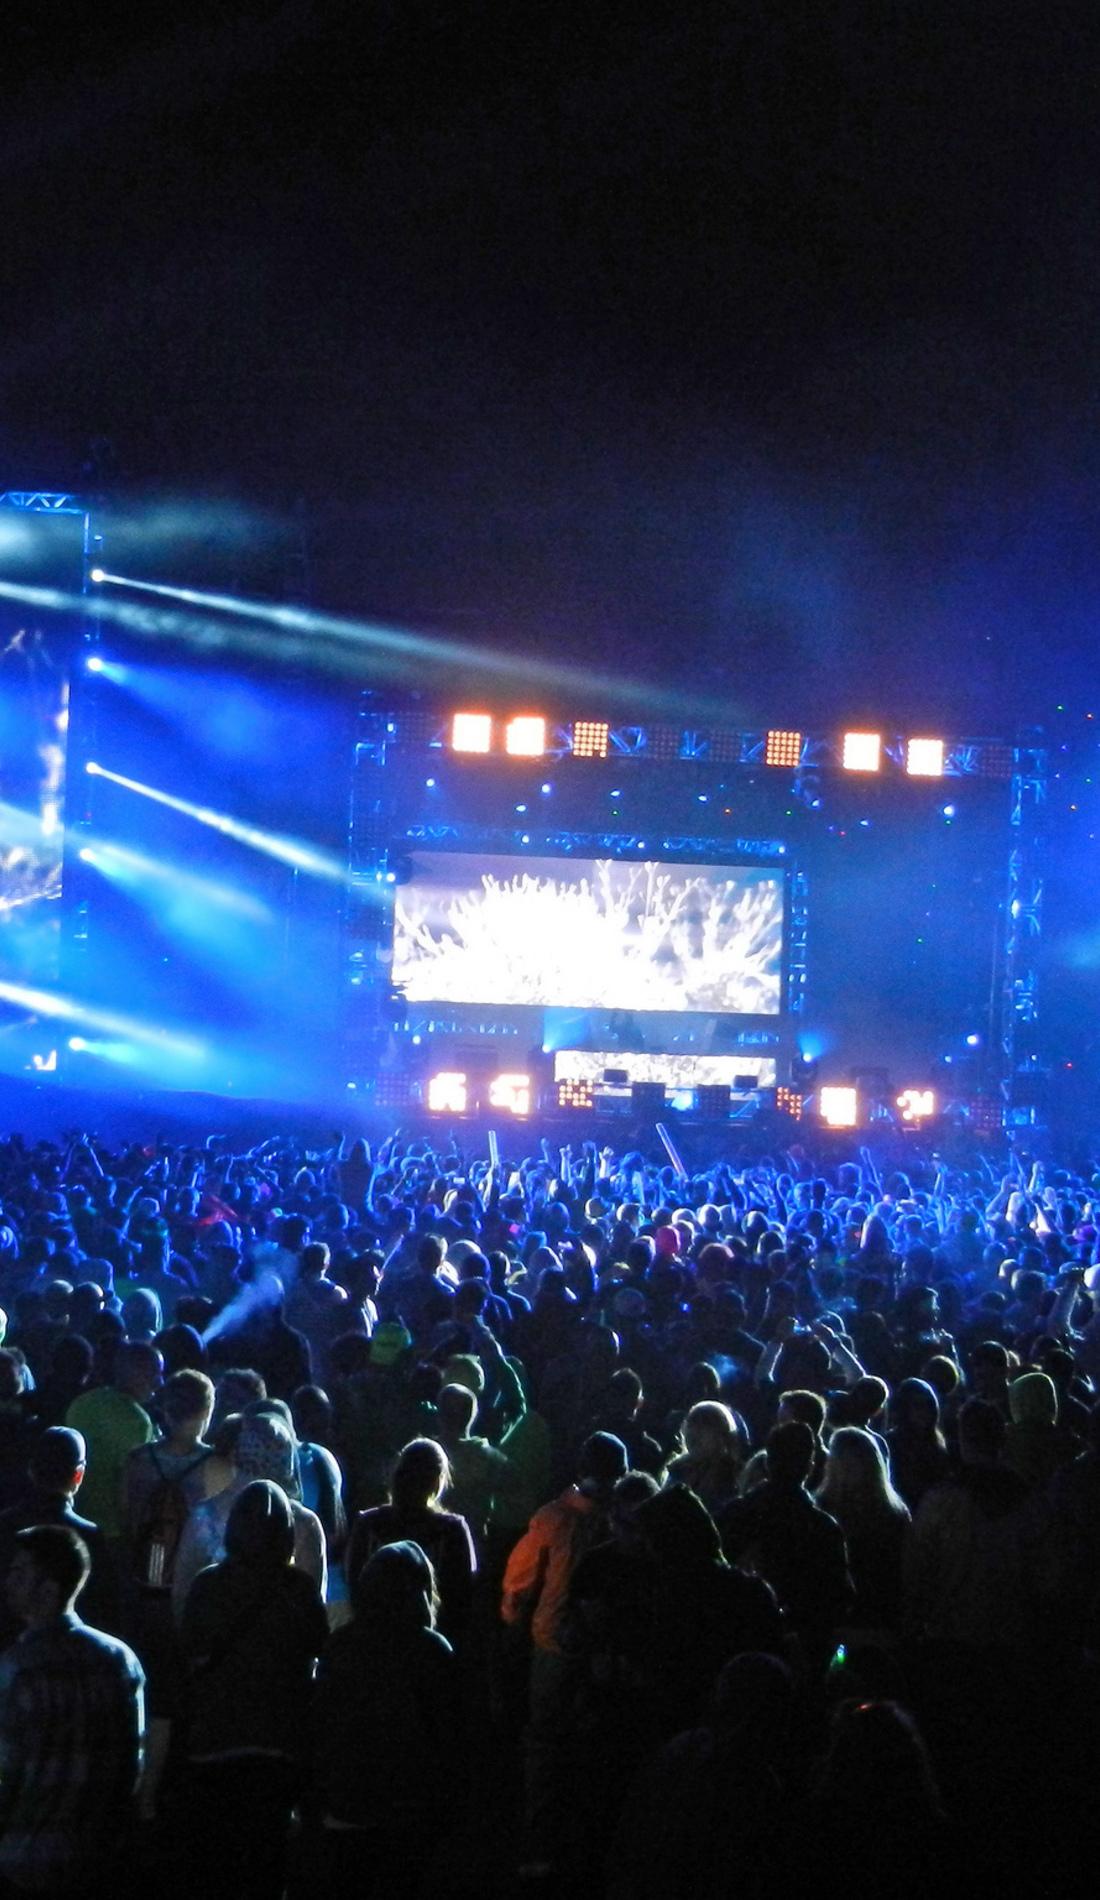 A Astroworld Festival live event